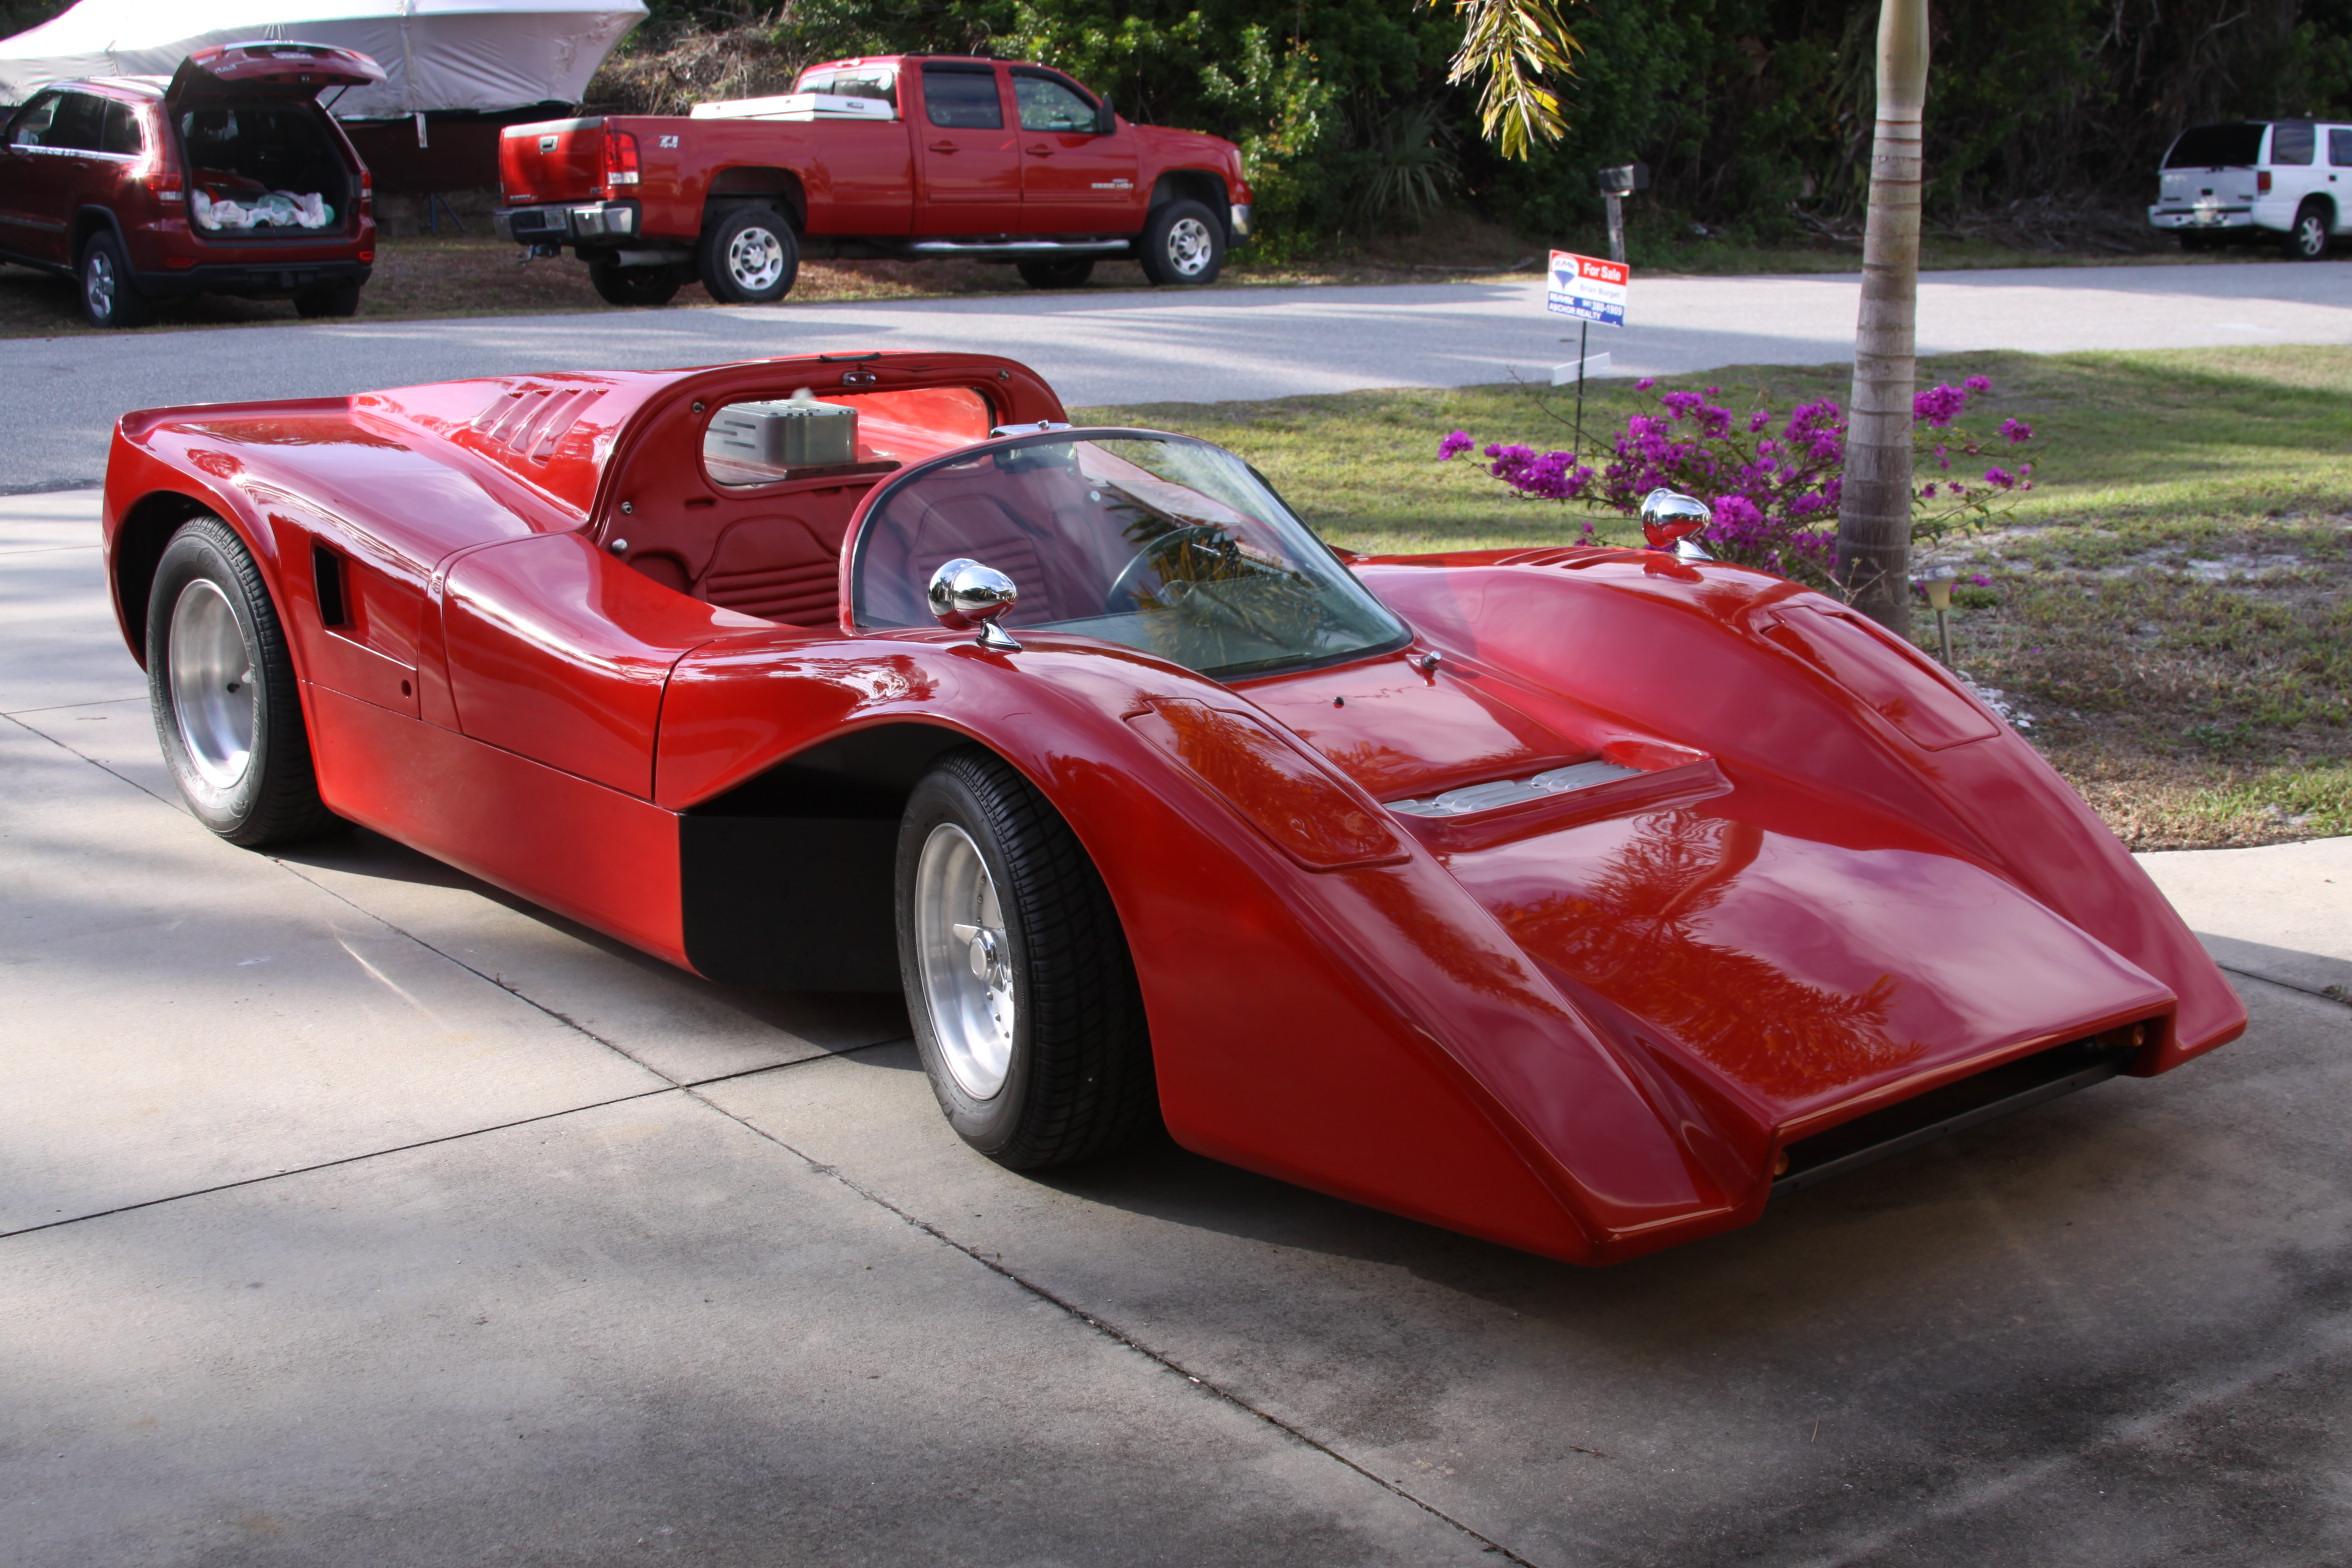 manta montage archives kit car and handcrafted vehicle. Black Bedroom Furniture Sets. Home Design Ideas